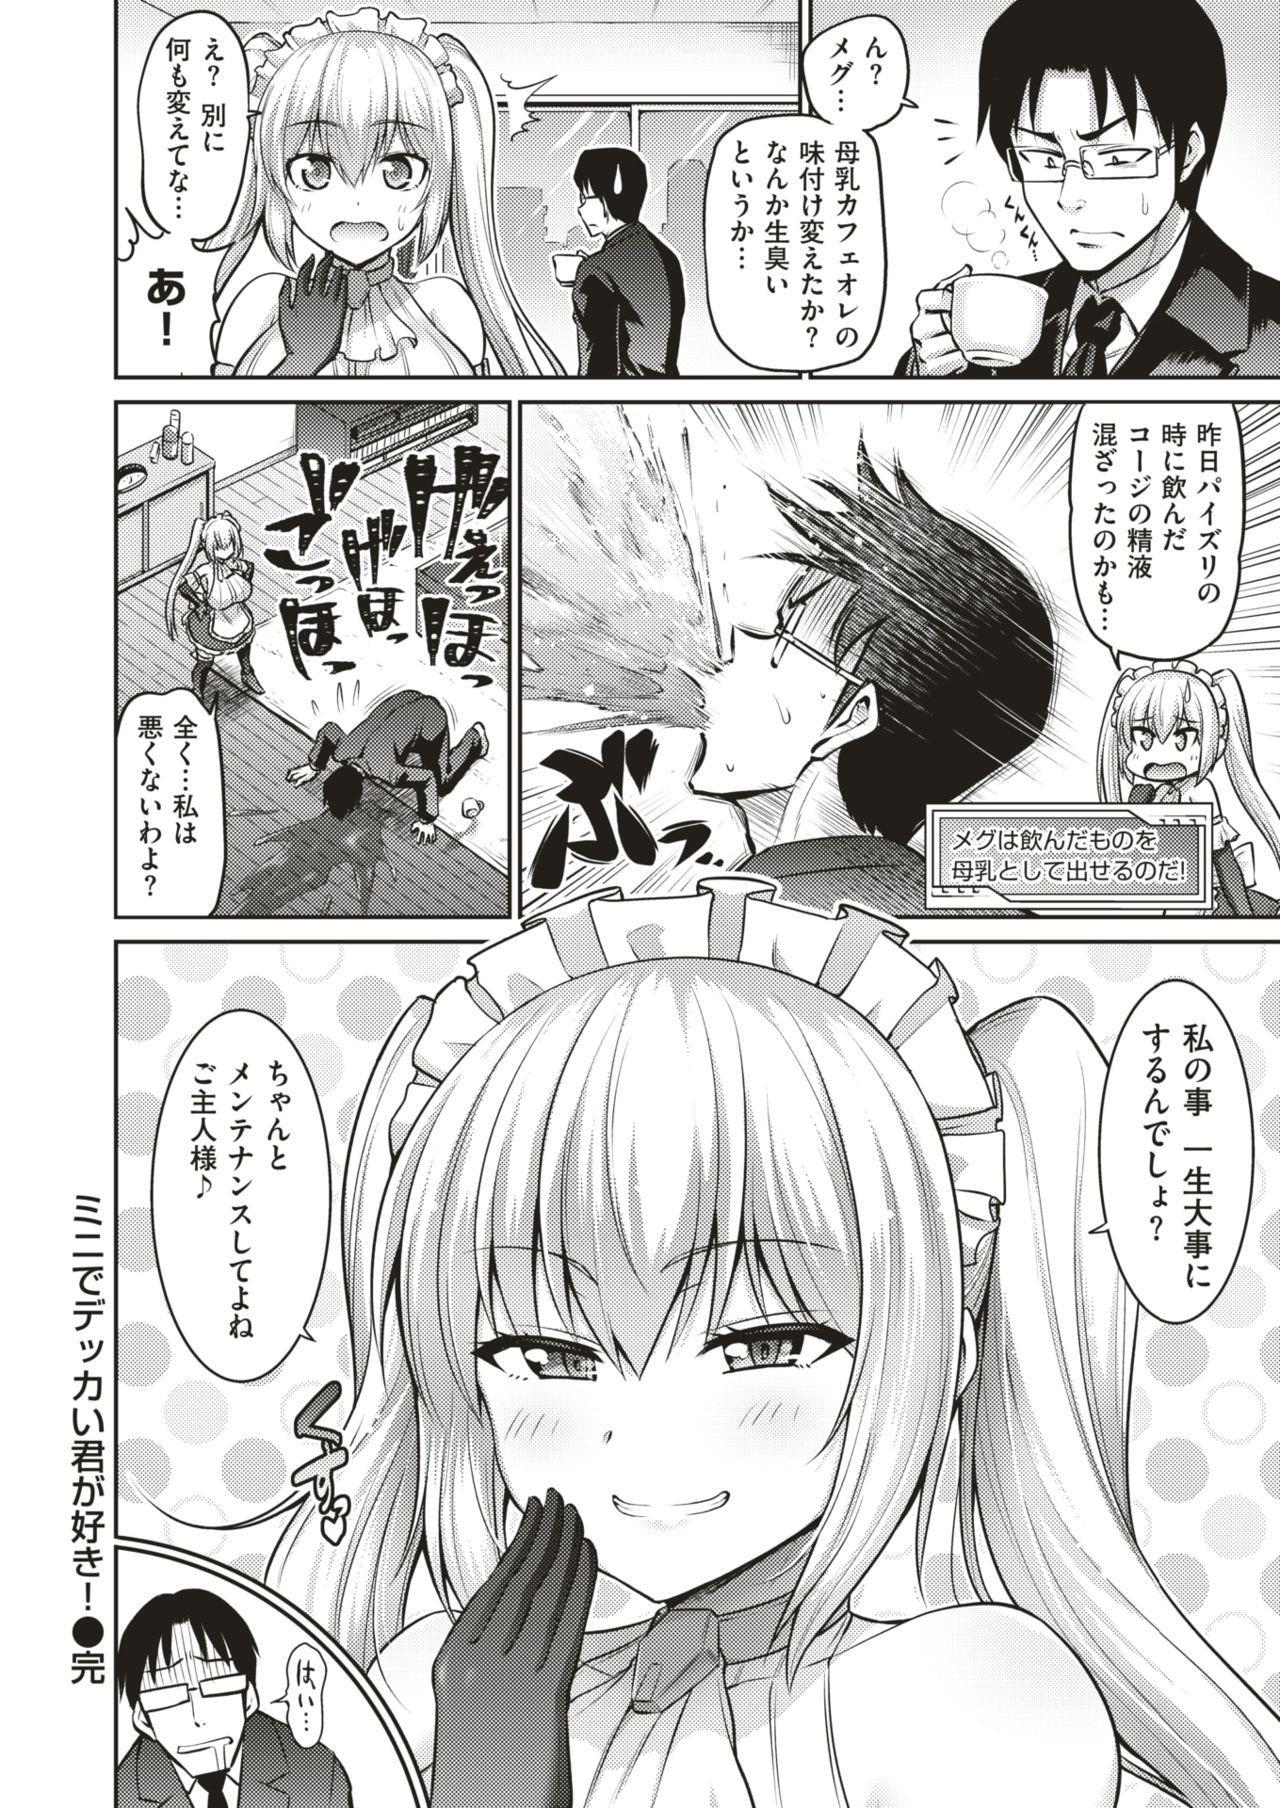 COMIC HAPPINING Vol. 4 34